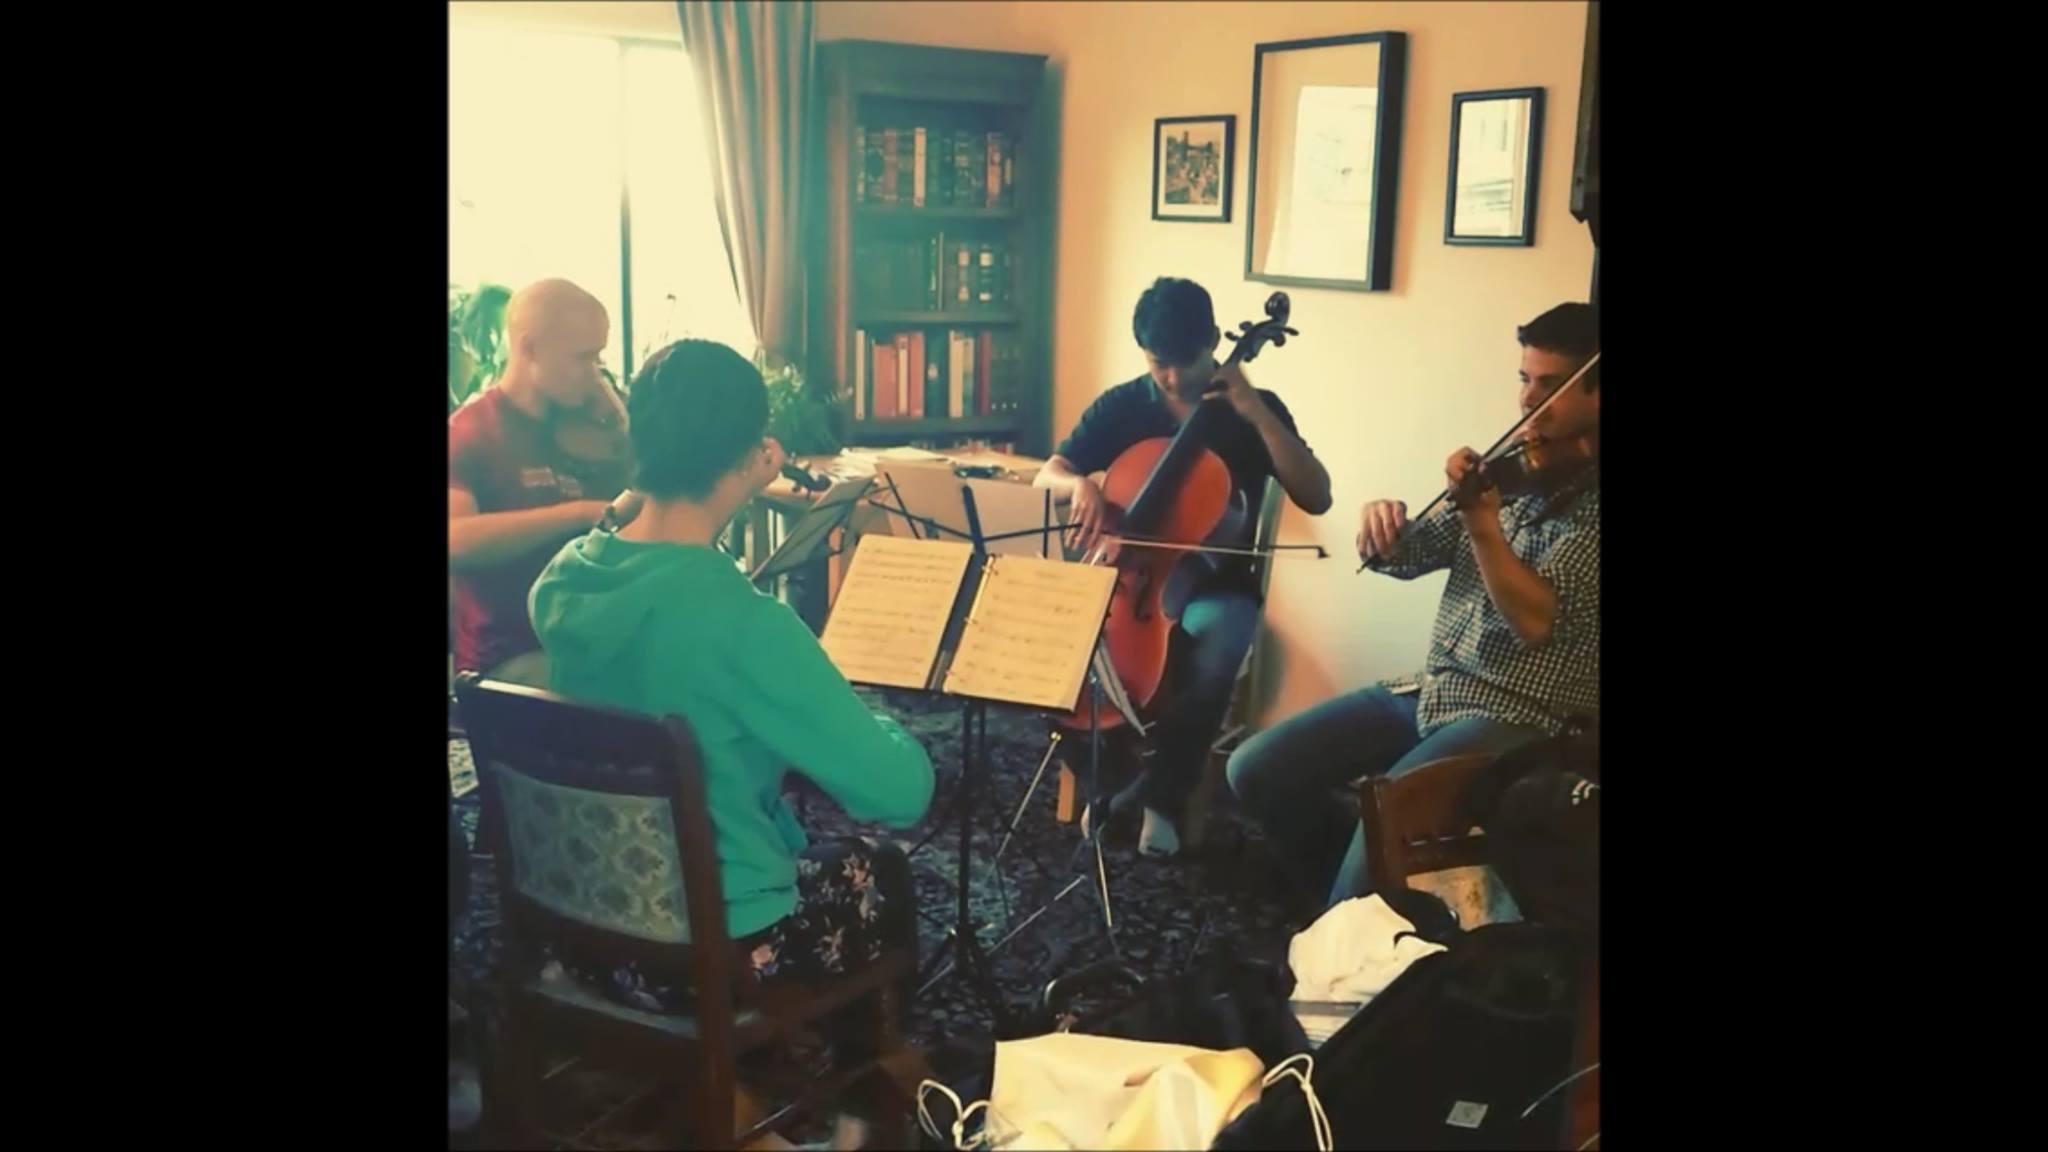 Rehearsing string quartet no.1 by Jose Gonzalez Granero